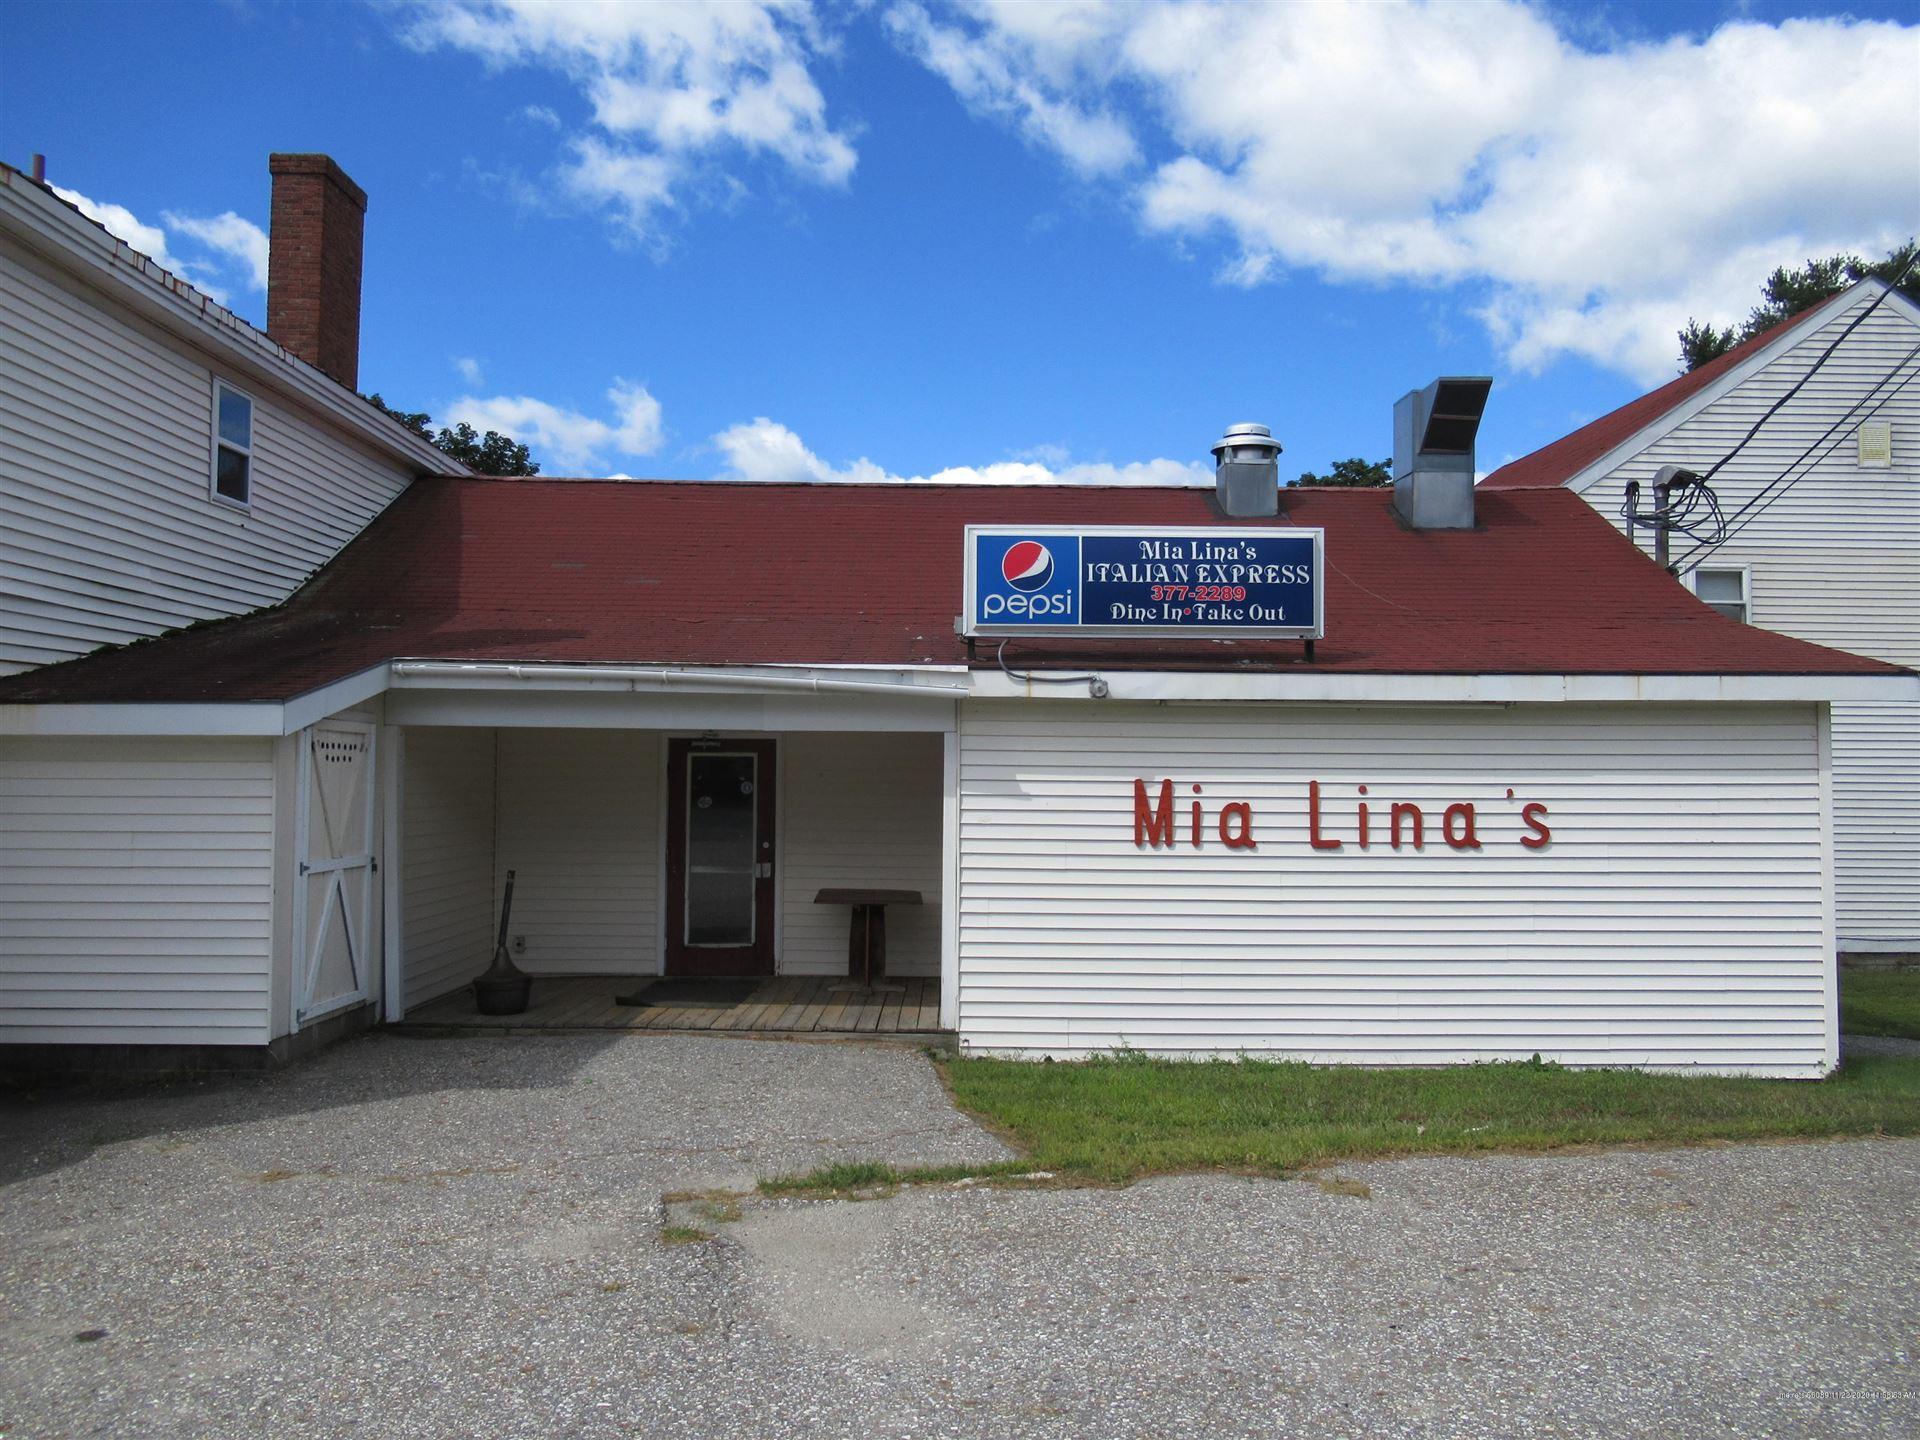 Photo of 206 Main Street, Winthrop, ME 04364 (MLS # 1468056)